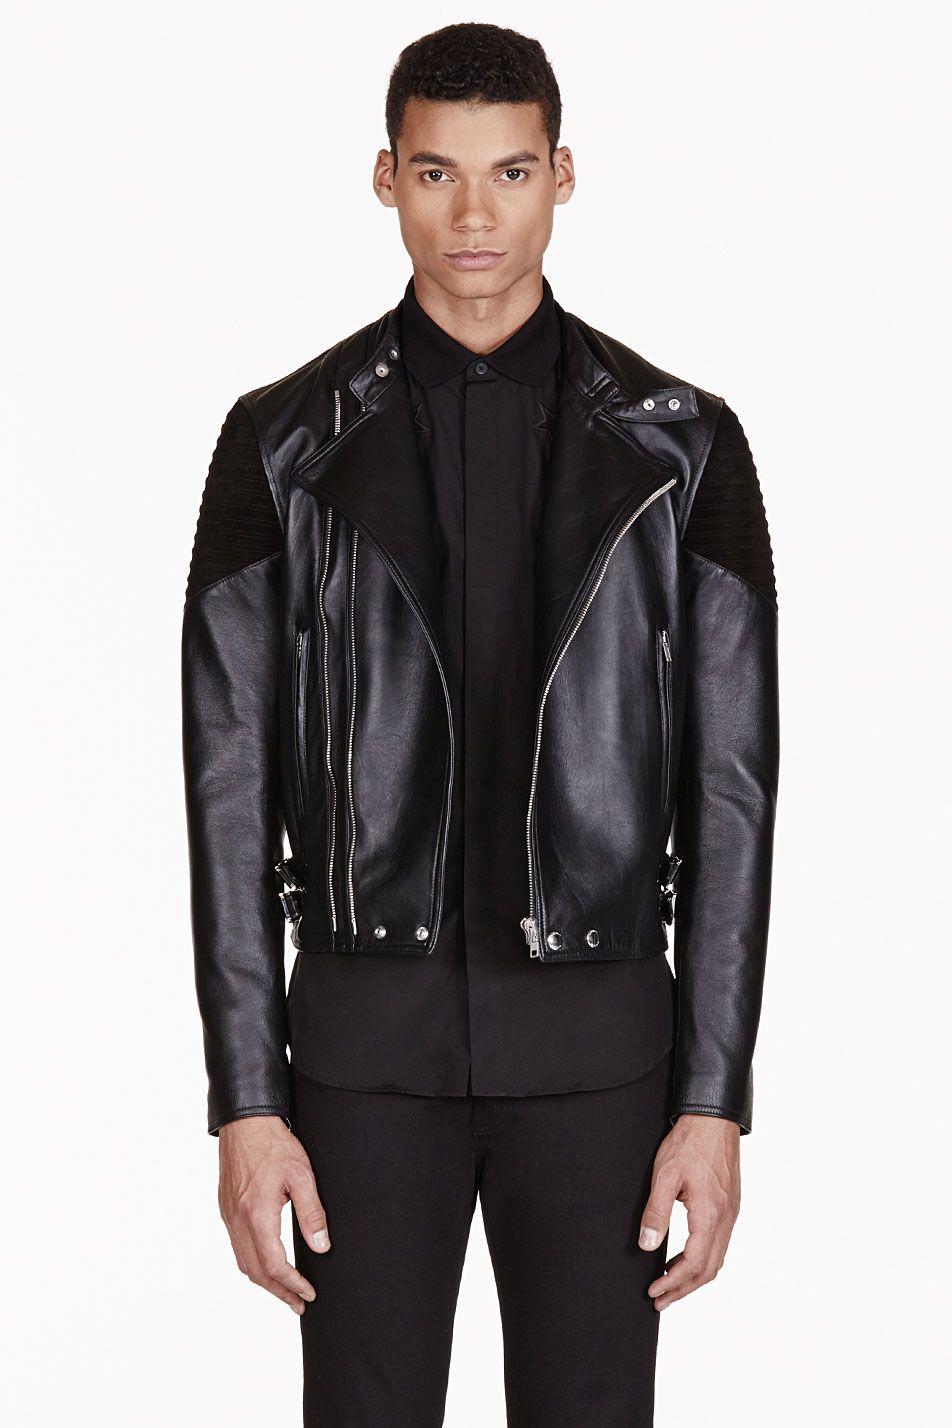 Givenchy Black Ribbed Leather Biker Jacket [ 1428 x 952 Pixel ]